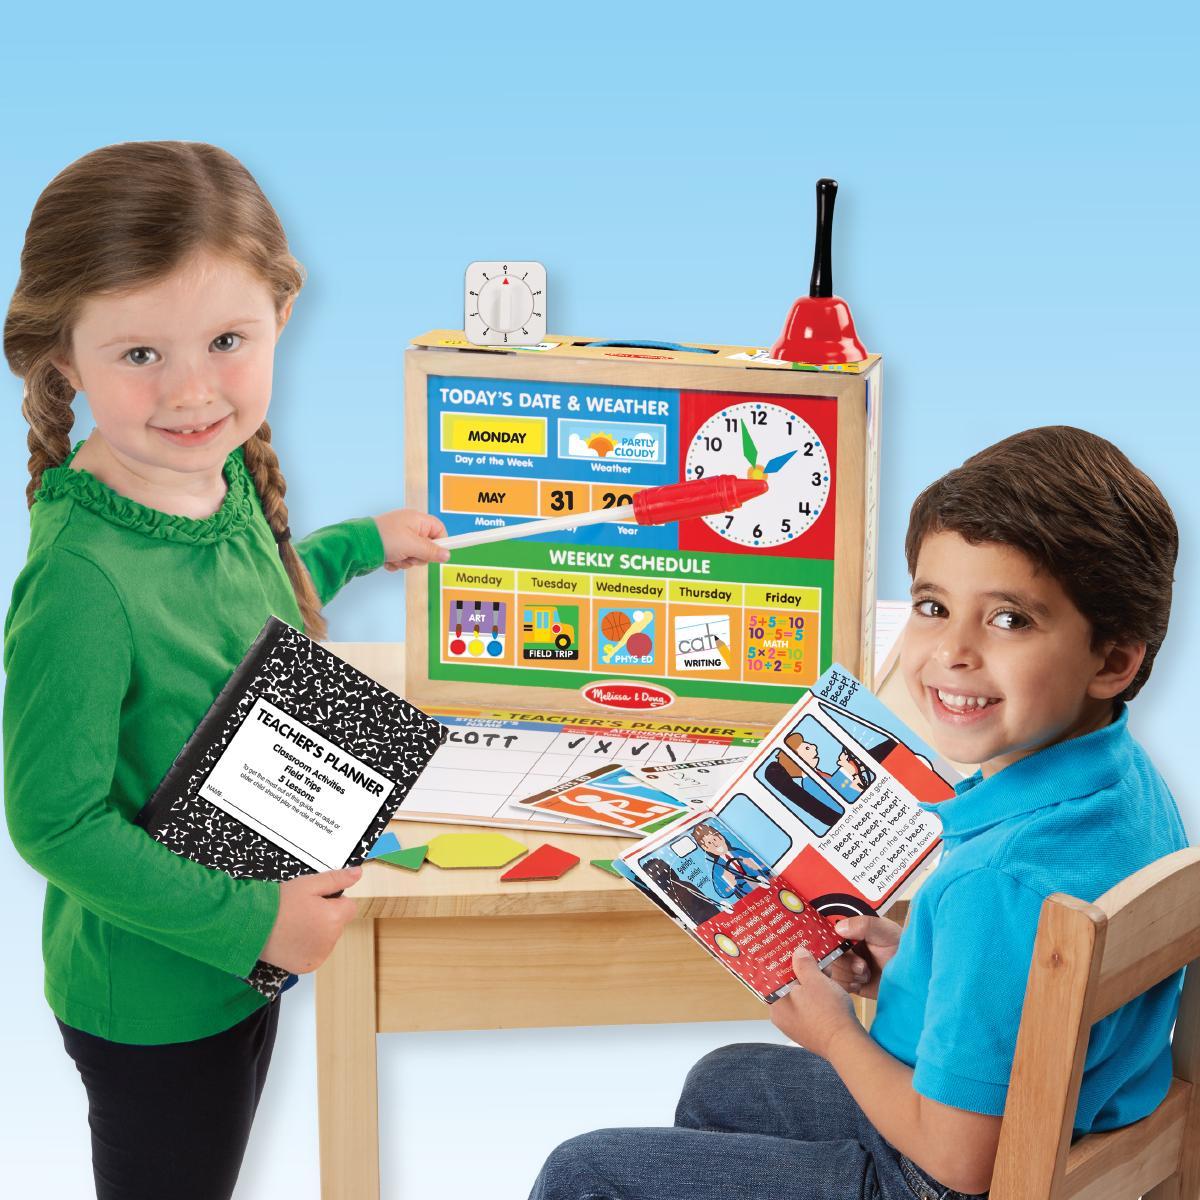 Amazon.com: Melissa & Doug School Time! Classroom Play Set